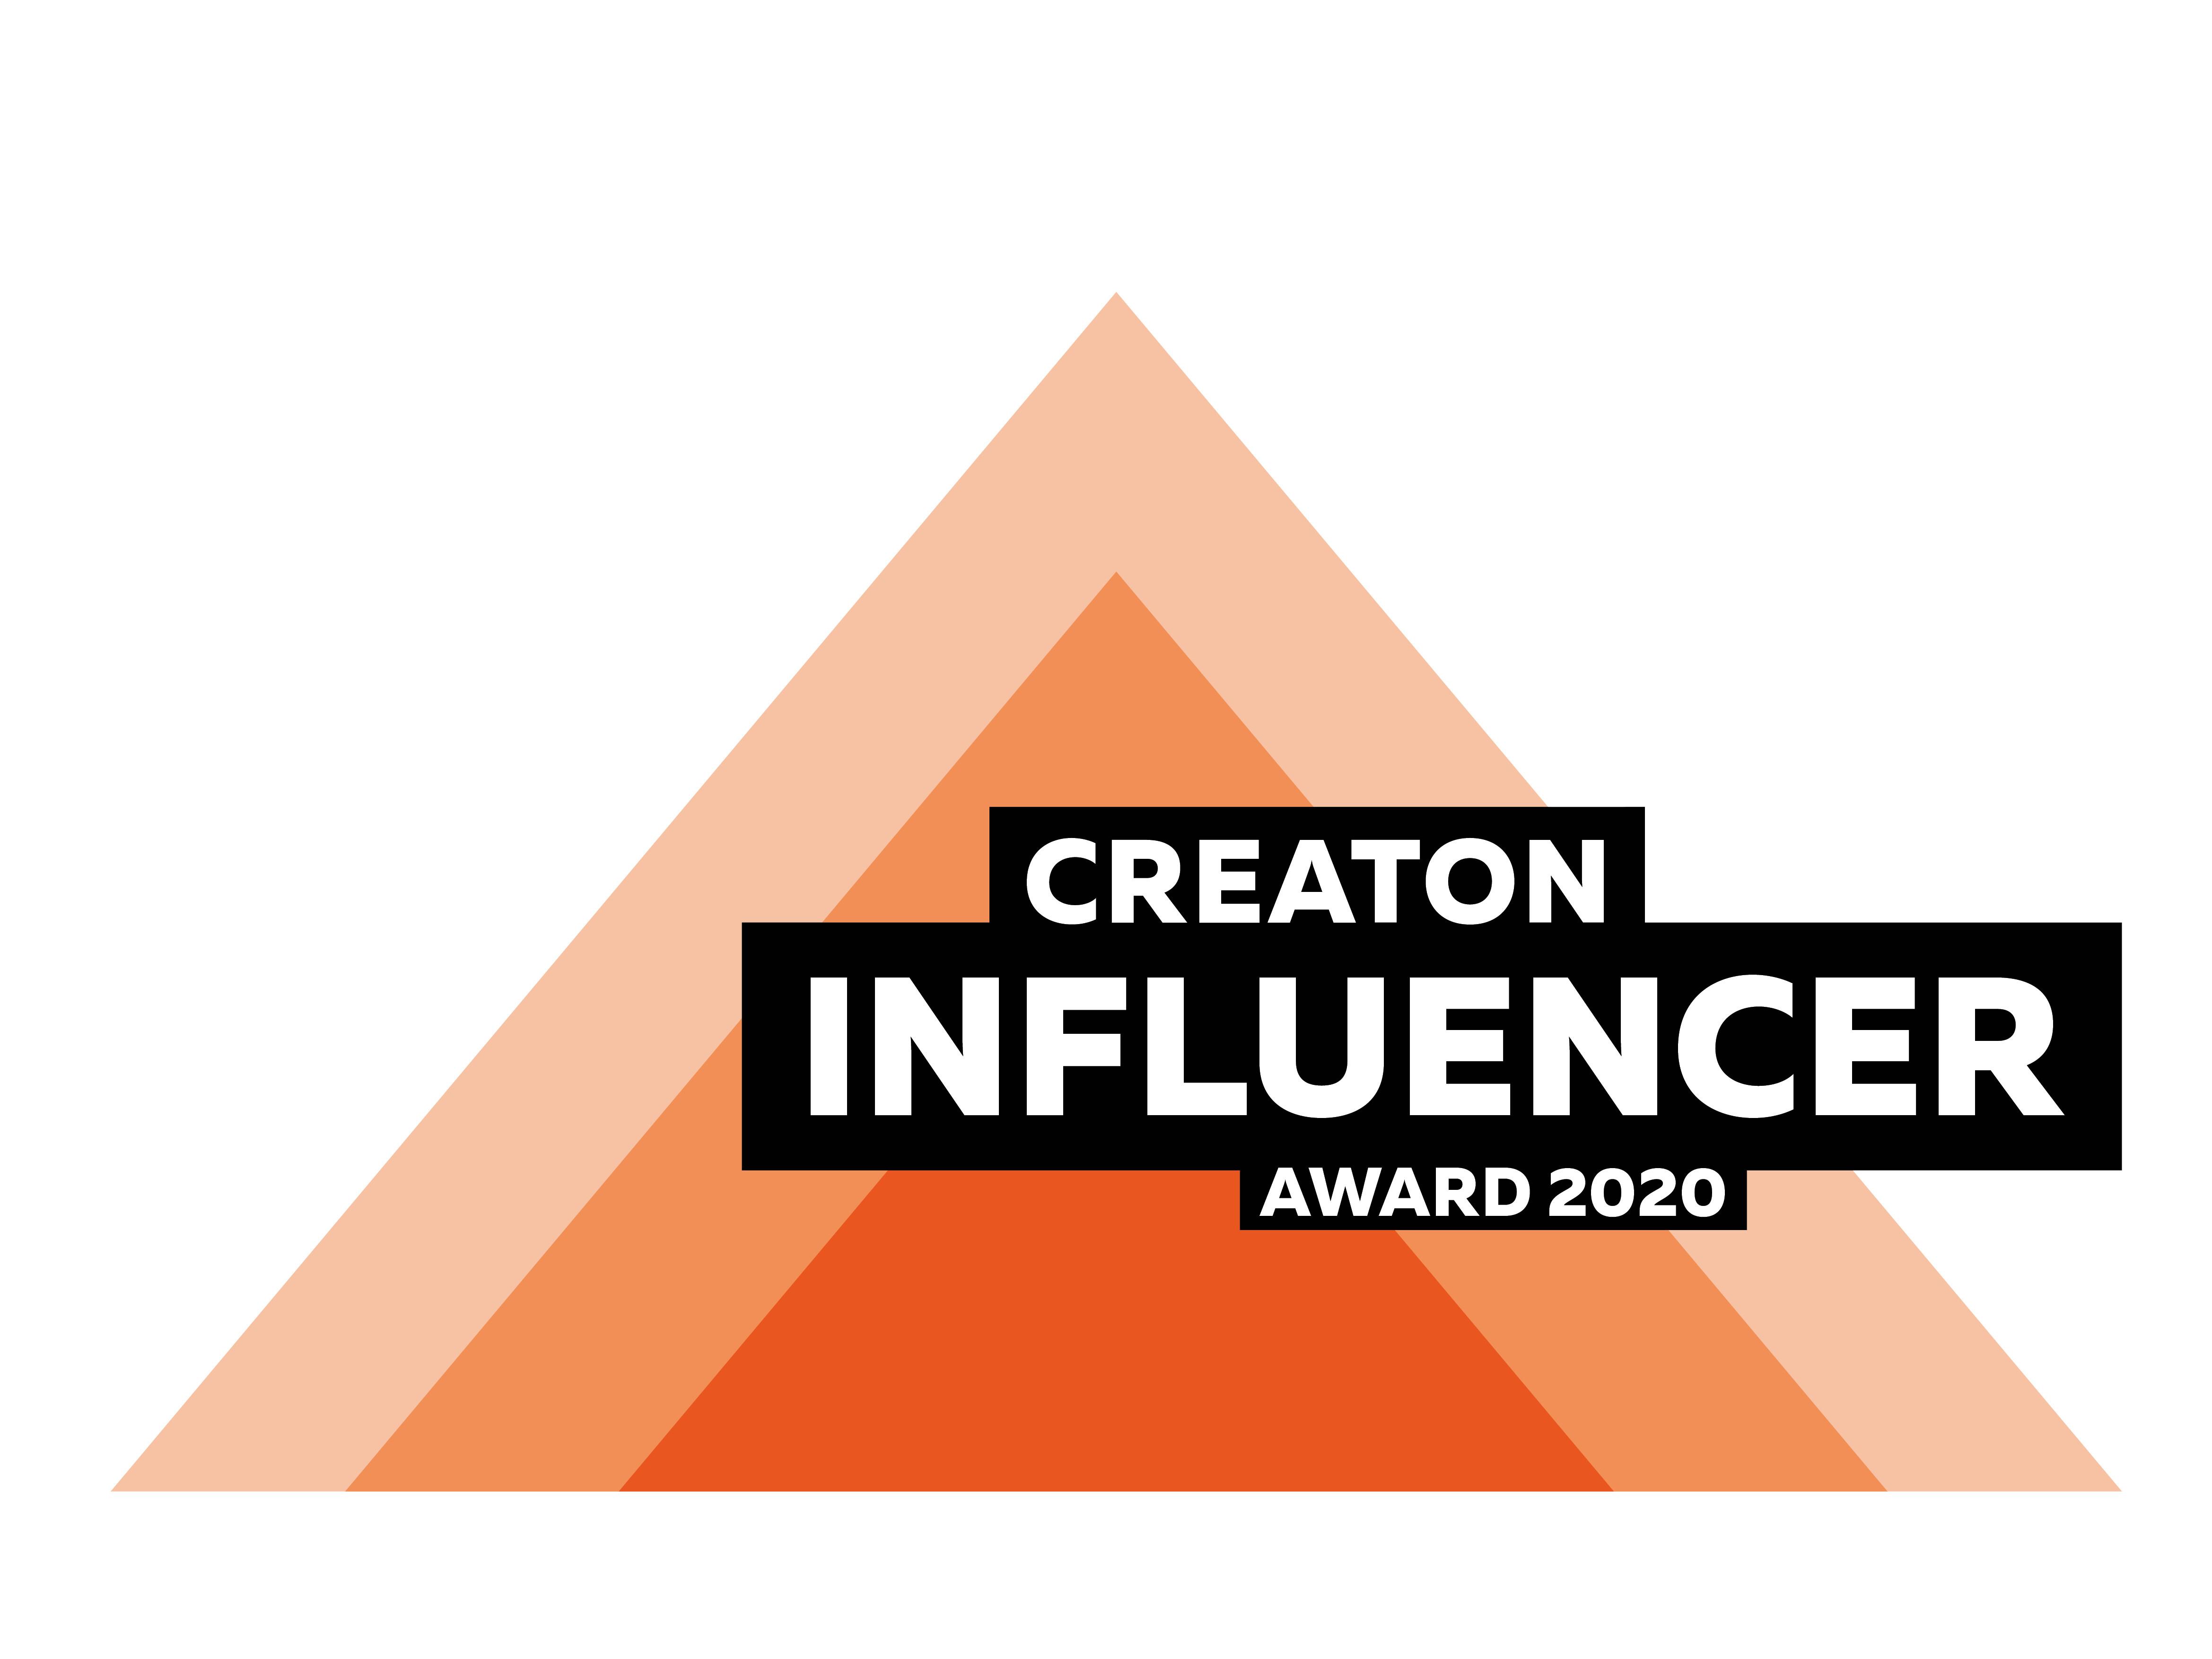 CREATON Influencer Award 2020